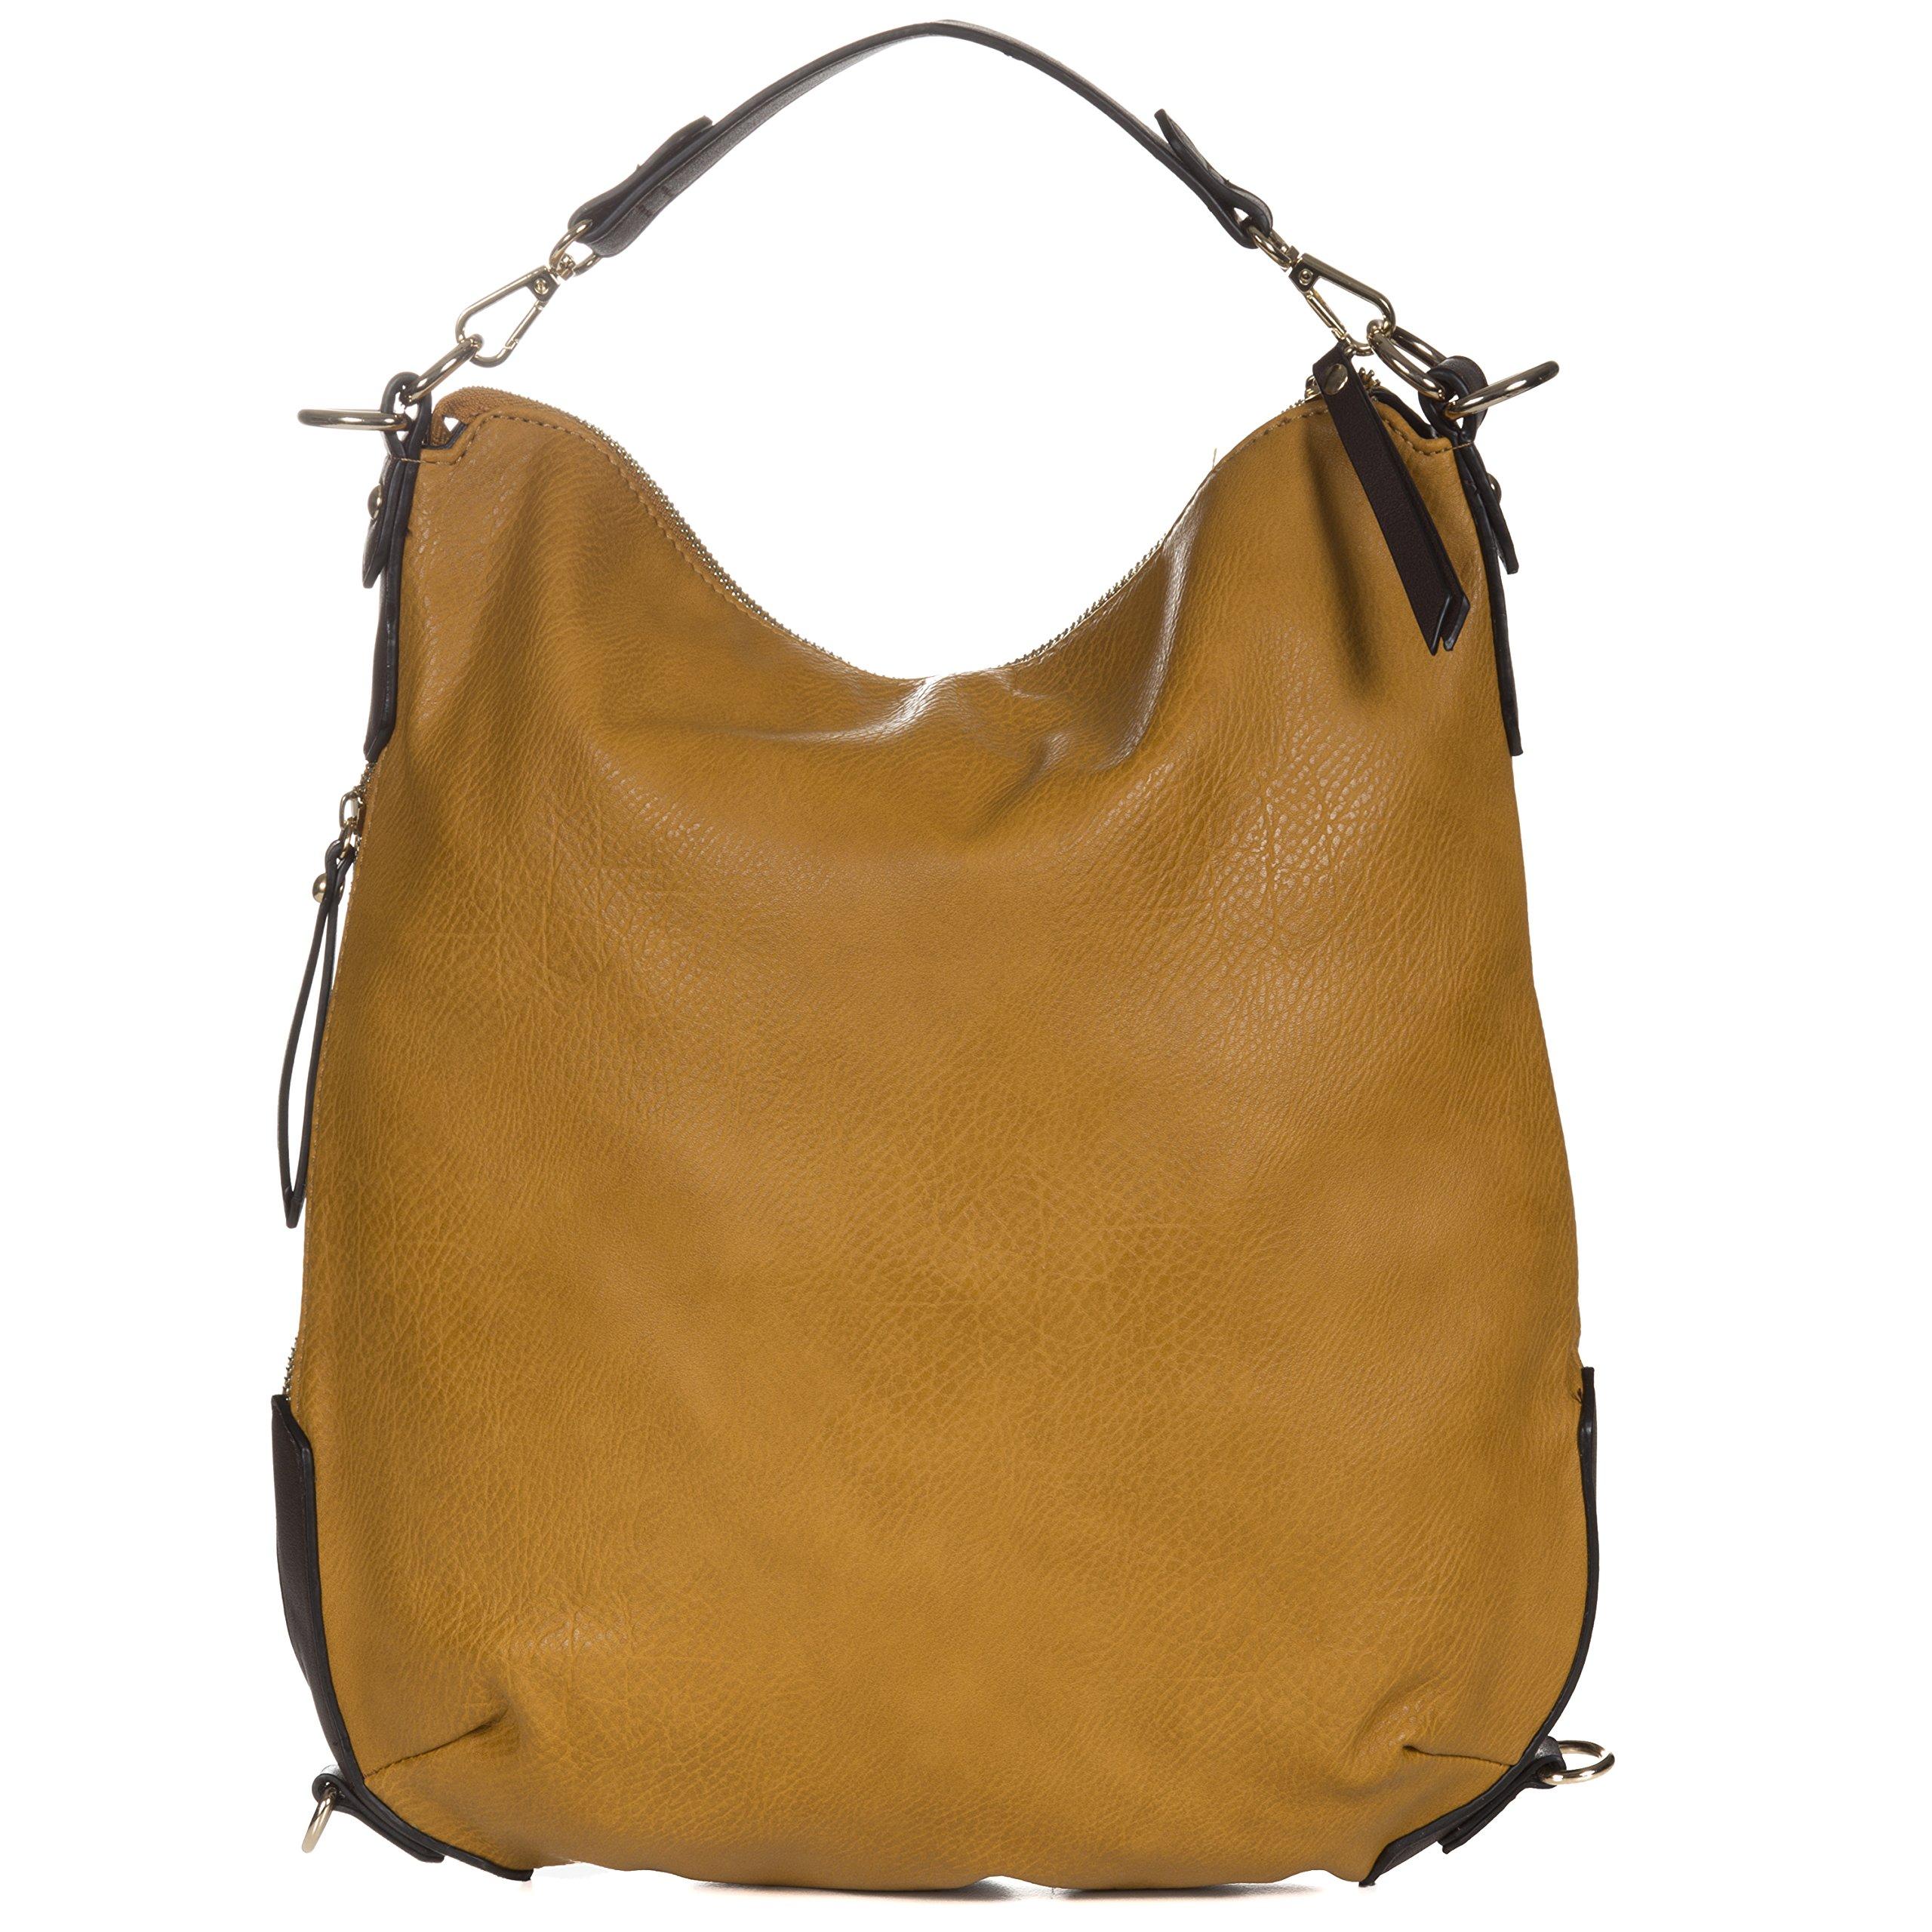 Handbag Republic Vegan Leather Women's PU Leather Designer Handbag Top Handle Tote Convertible Backpack (Mustard)